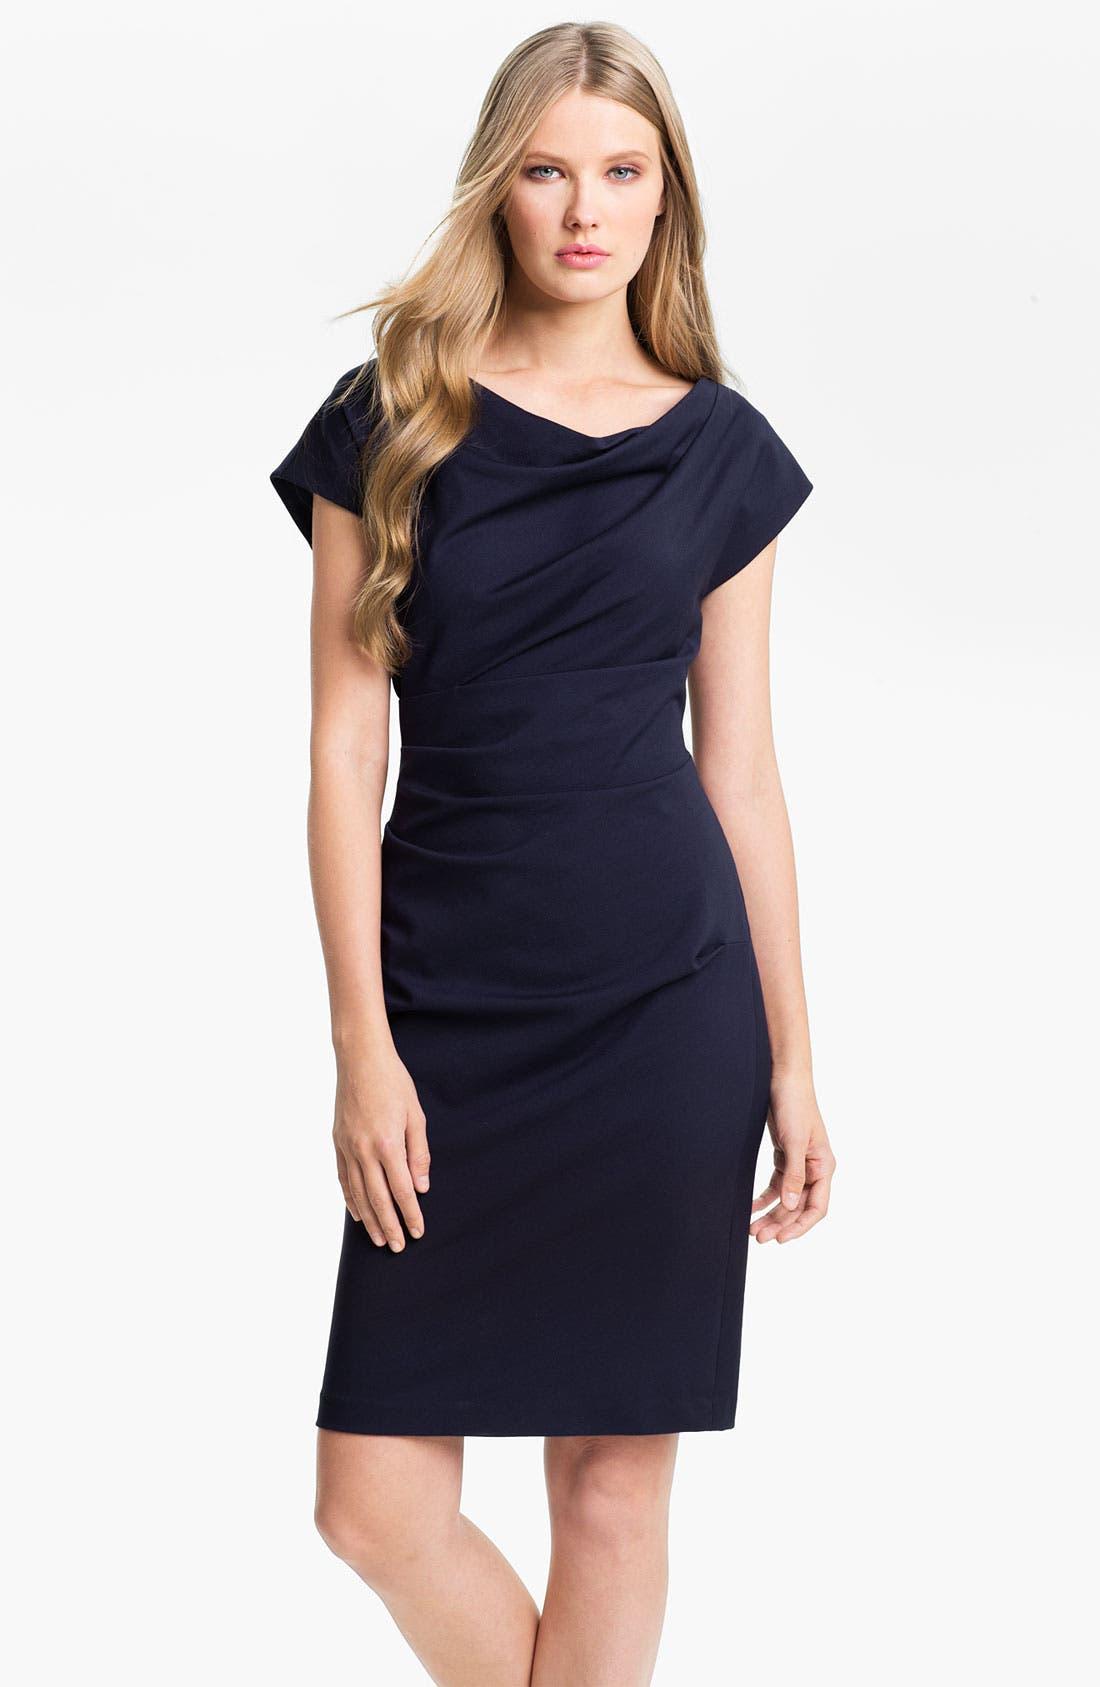 Alternate Image 1 Selected - Suzi Chin for Maggy Boutique Draped Neck Sheath Dress